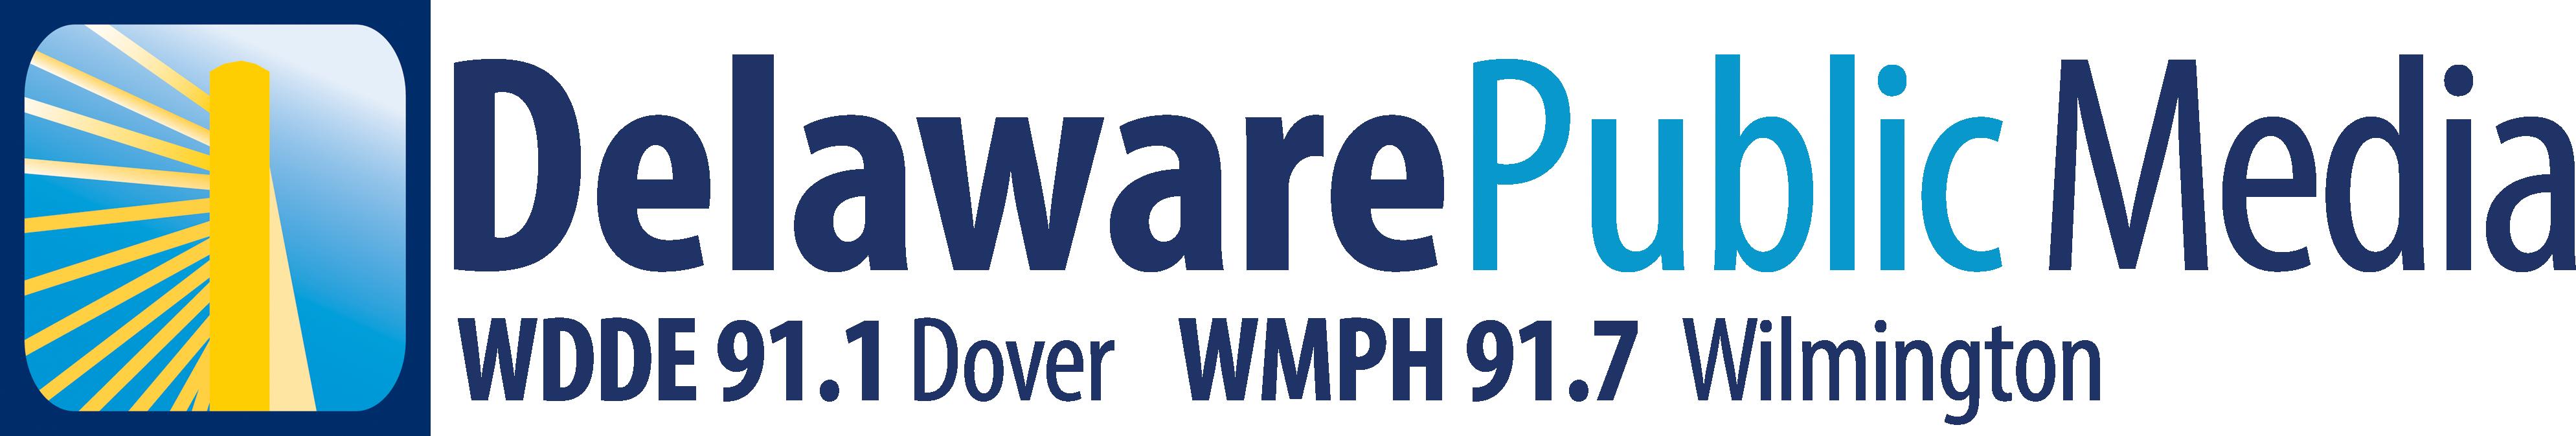 Delaware First Media logo